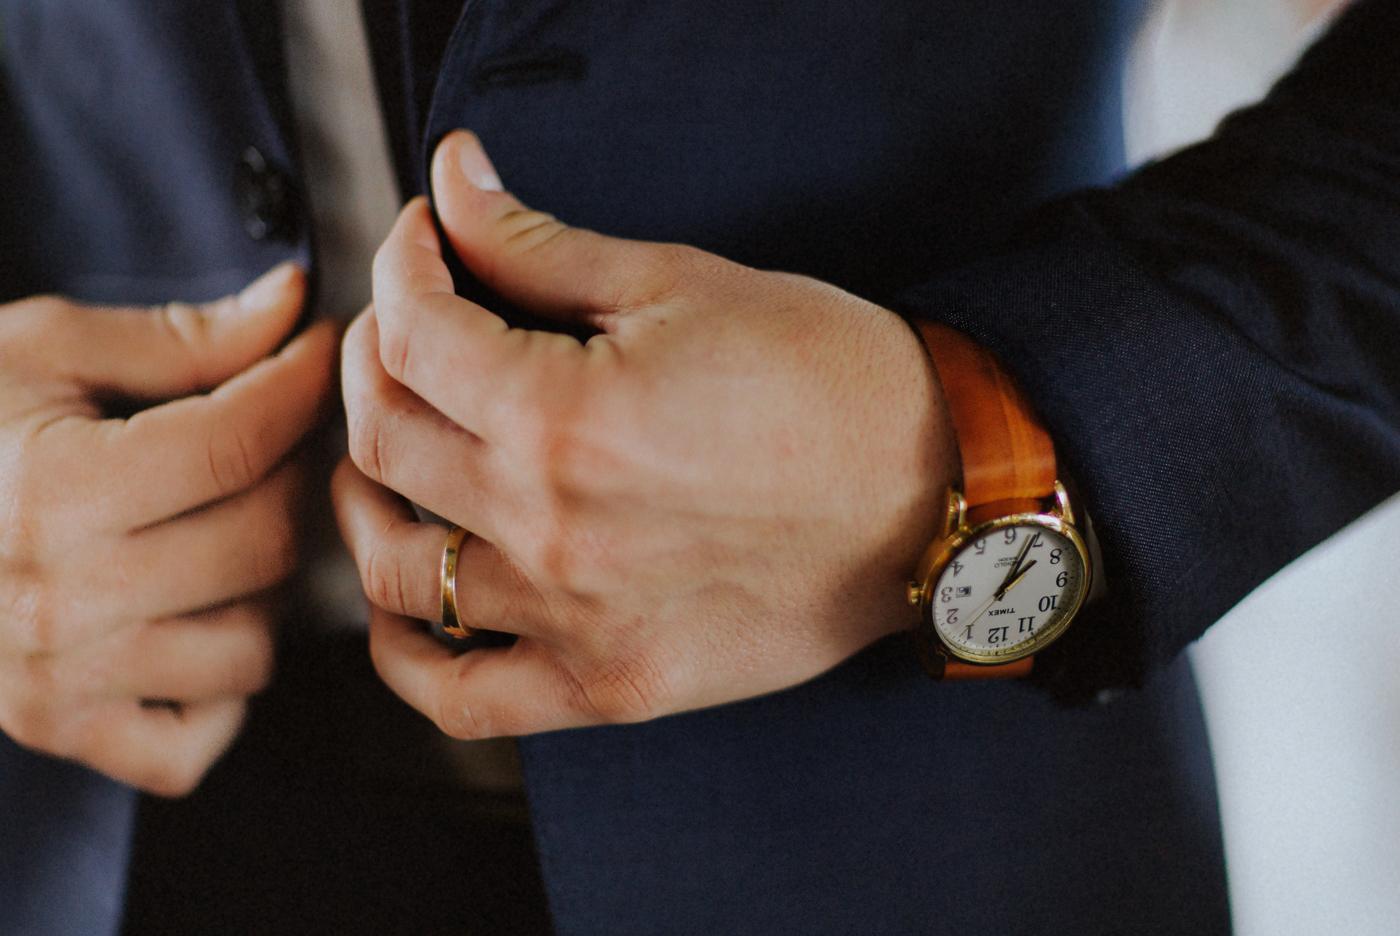 Wedding | Canvas Market | Lake Nona-Orlando, FL  | Vanessa Boy Photography | vanessaboy.com-53.com |Green Wedding Shoes.jpg